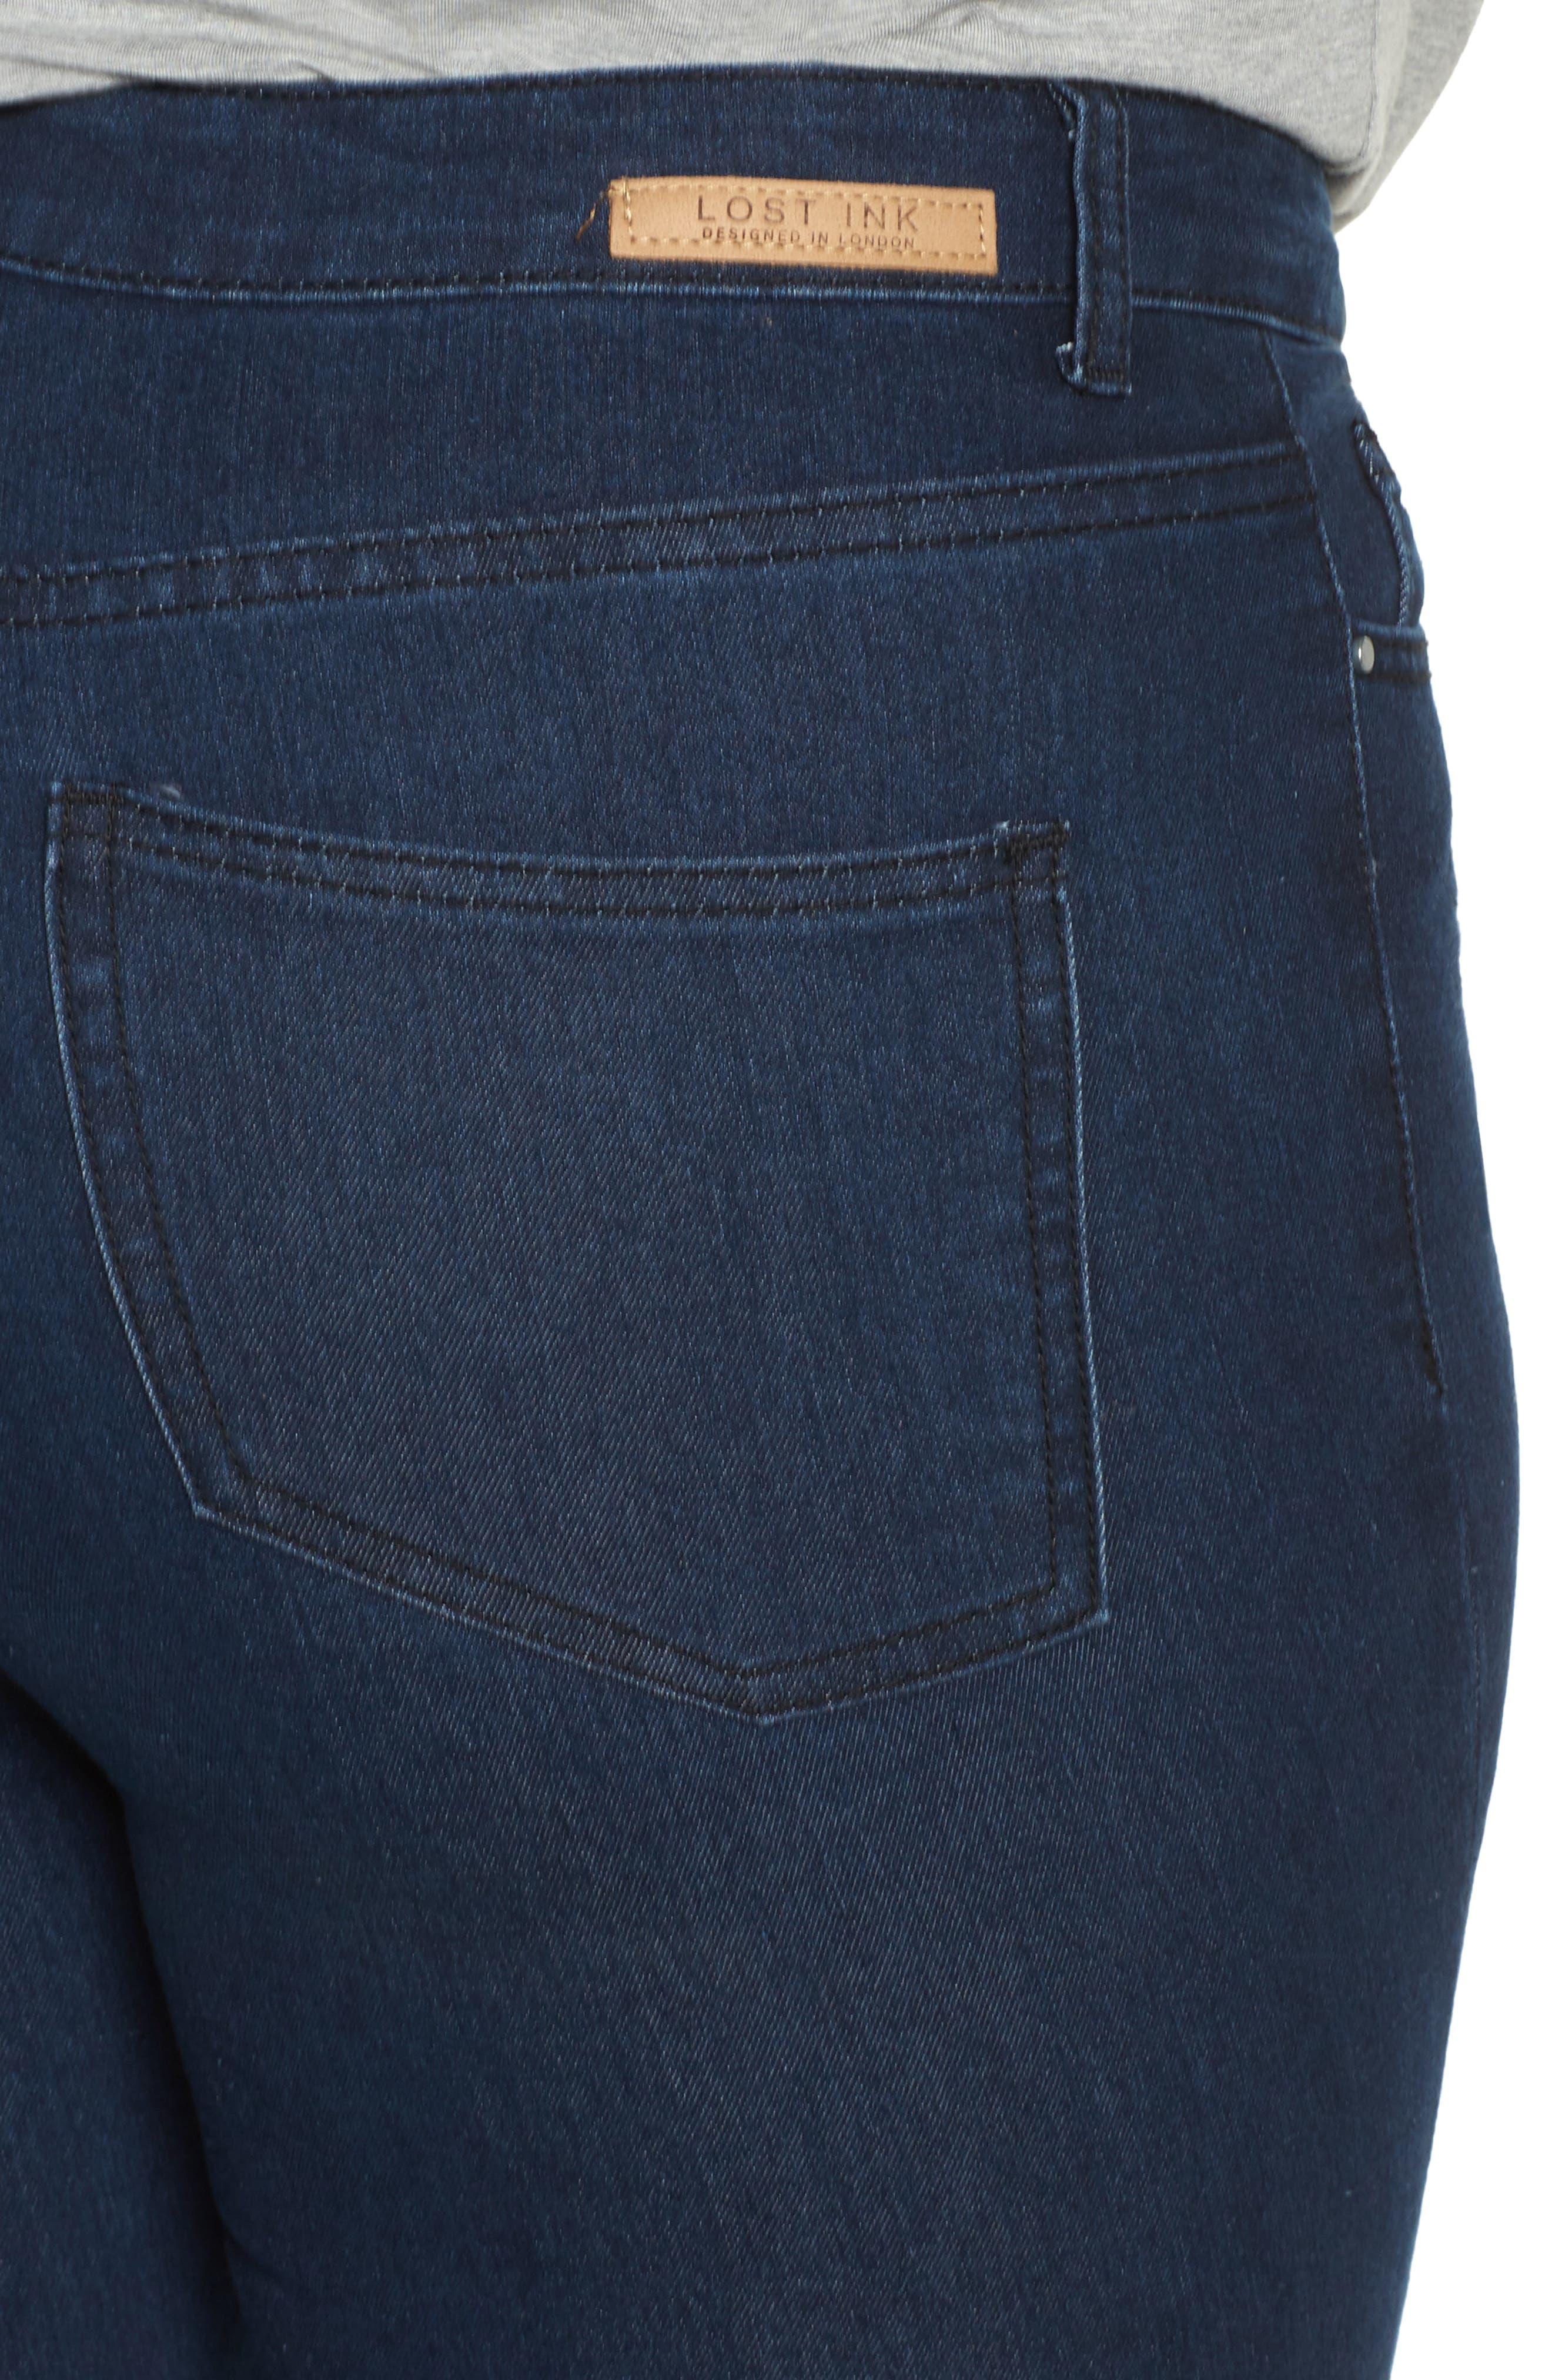 Super High-Waist Skinny Ankle Jeans,                             Alternate thumbnail 4, color,                             401